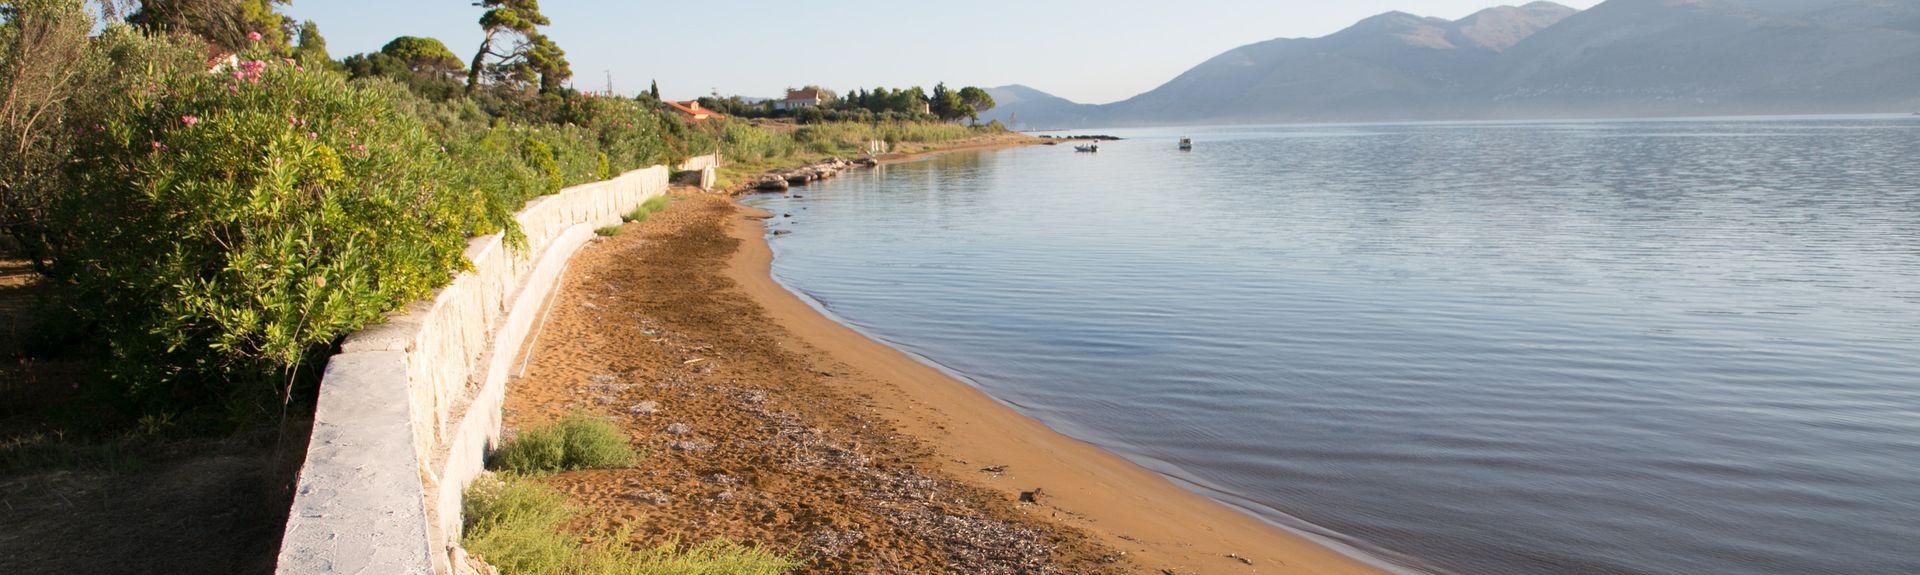 Myrtoksen uimaranta, Pilarei, Peloponnesos, Kreikka